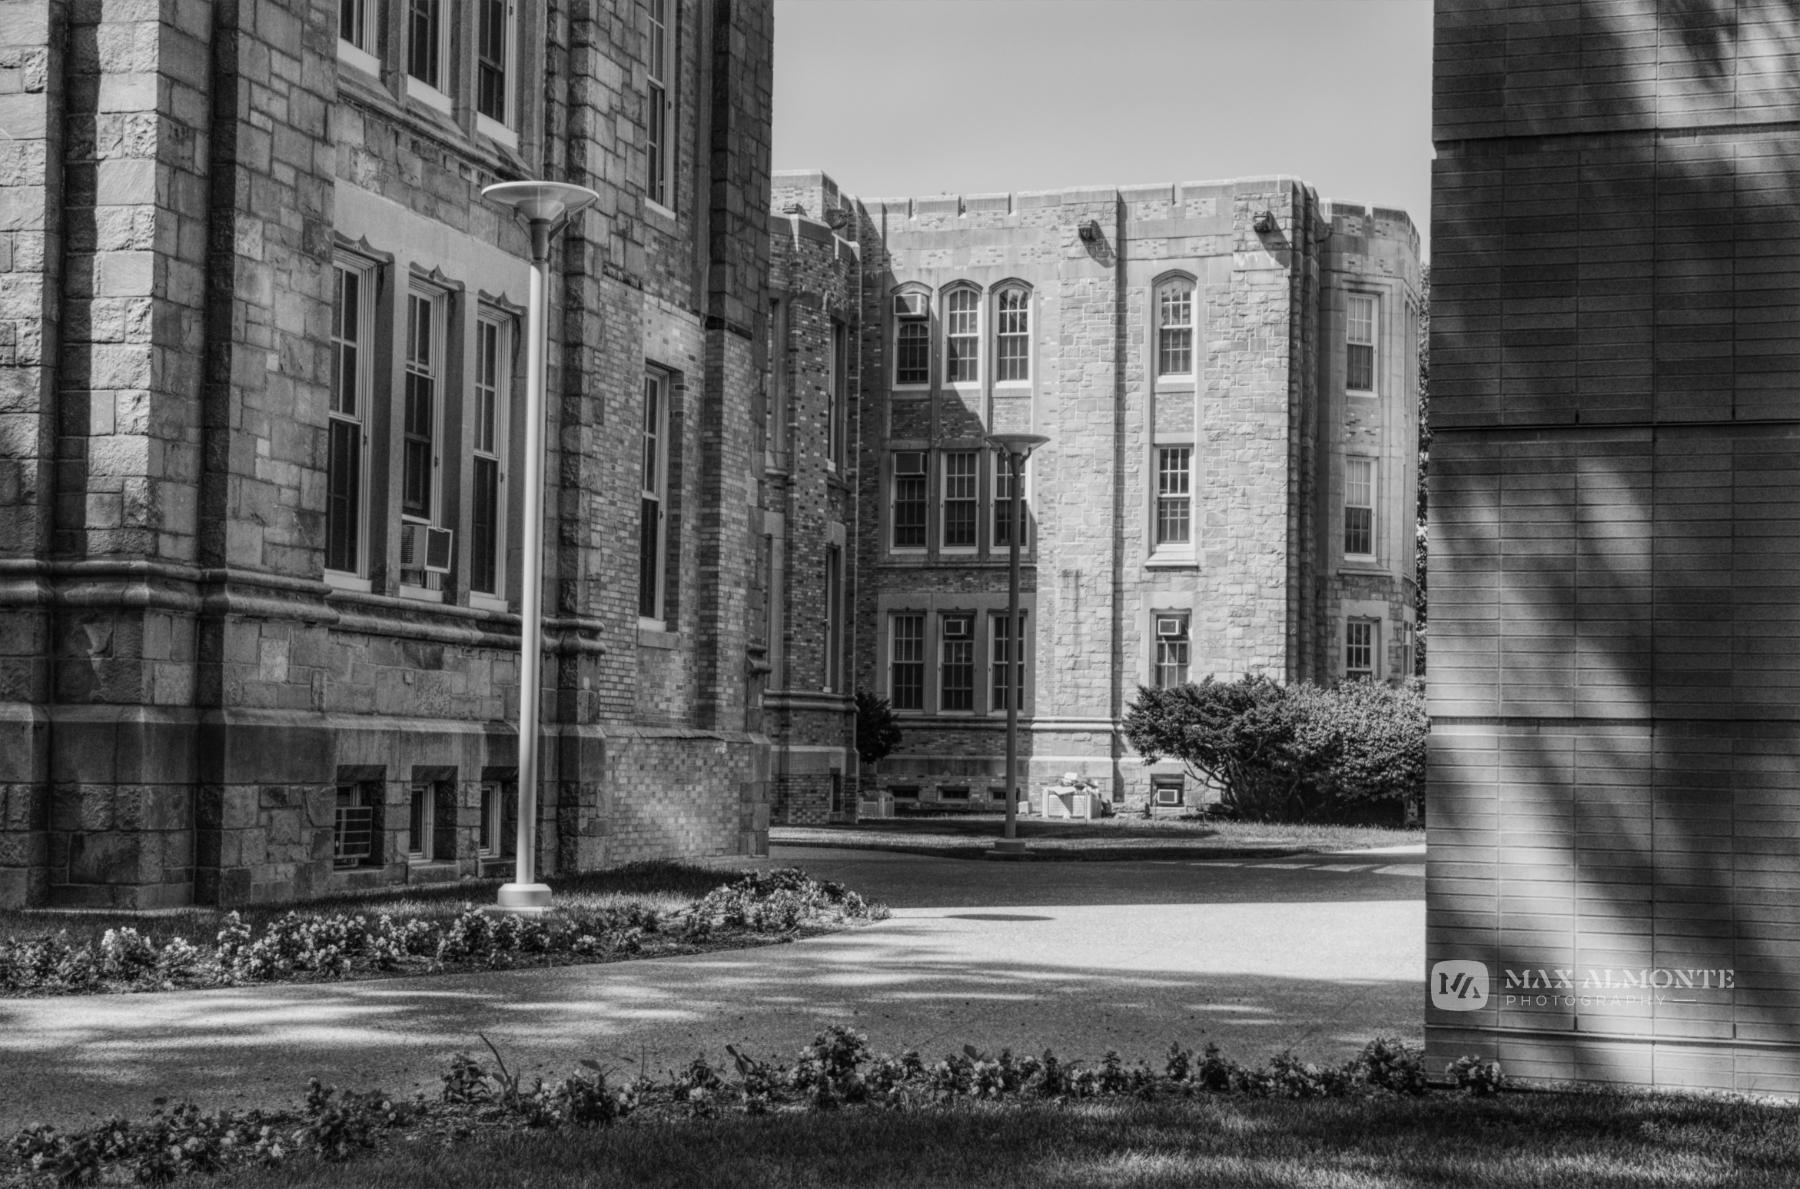 lehman campus-262_edit.jpeg